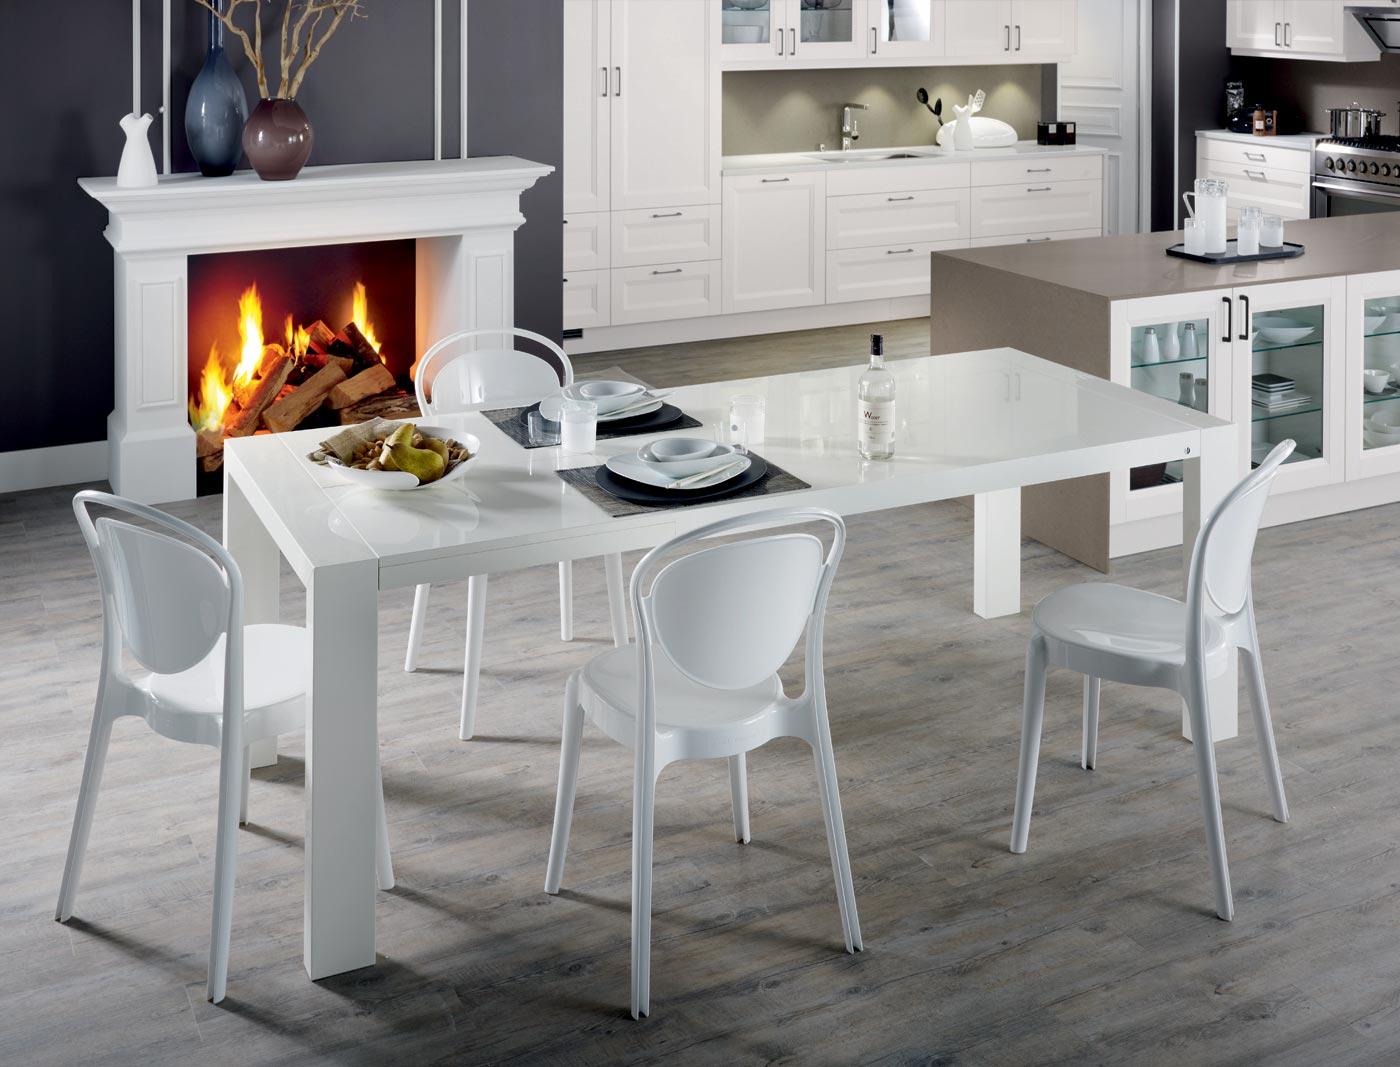 cuisine chronos laqu blanc structur perene lyon. Black Bedroom Furniture Sets. Home Design Ideas